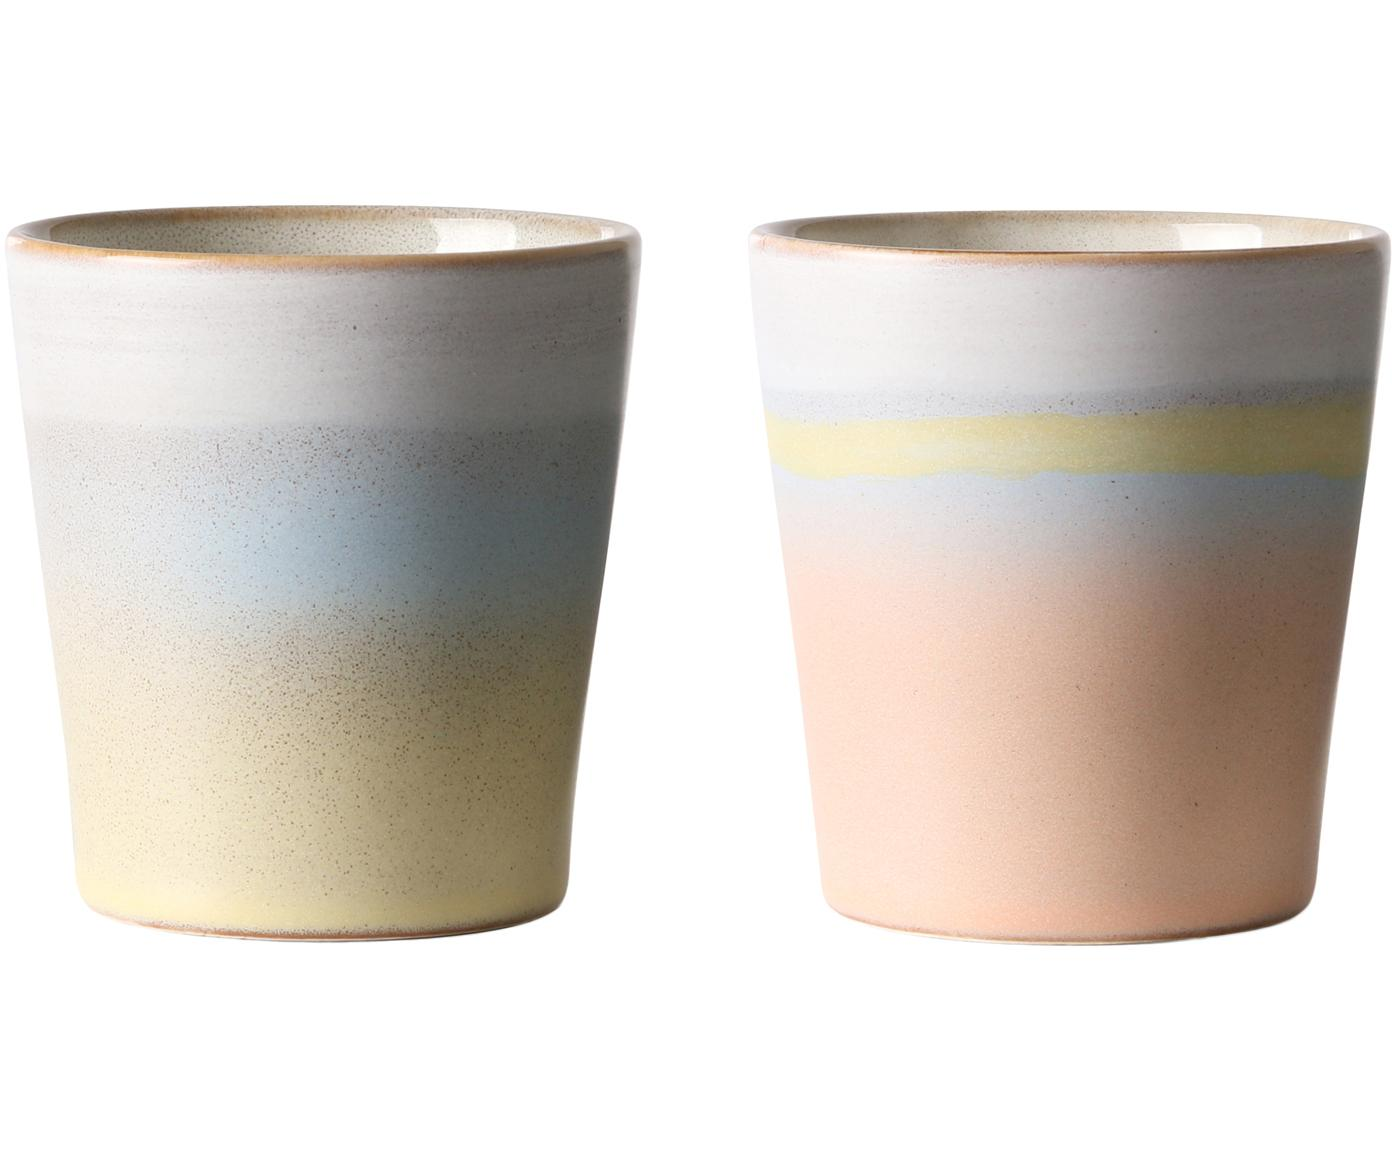 Handgemachtes XS Becher-Set 70's, 2-tlg., Keramik, Mehrfarbig, Ø 8 x H 8 cm